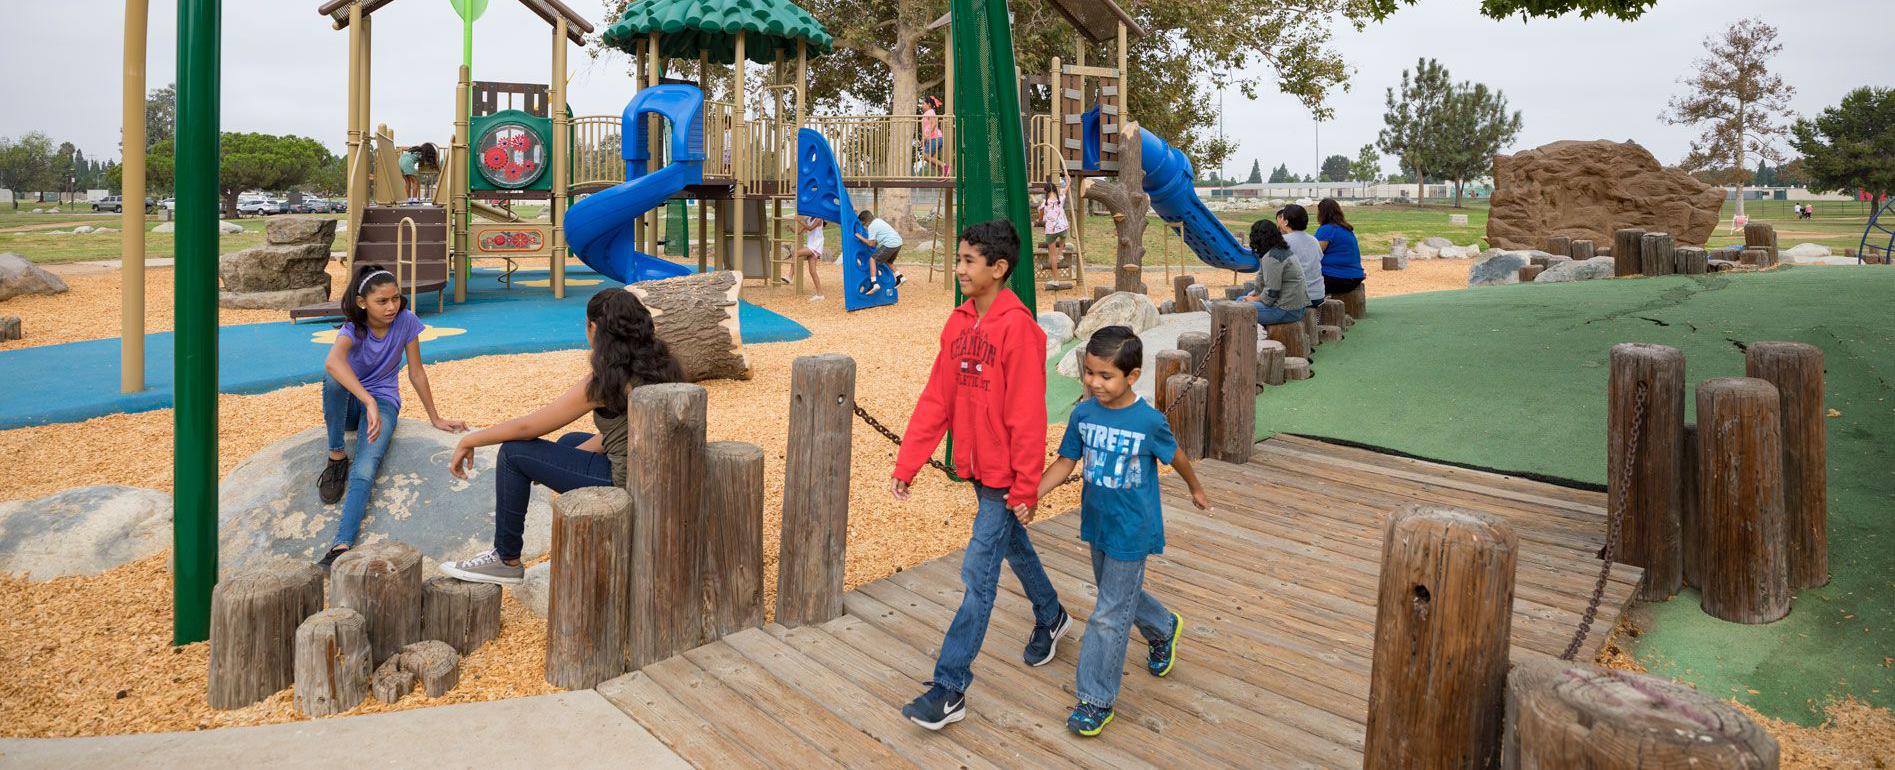 Boys walking through playground equipment